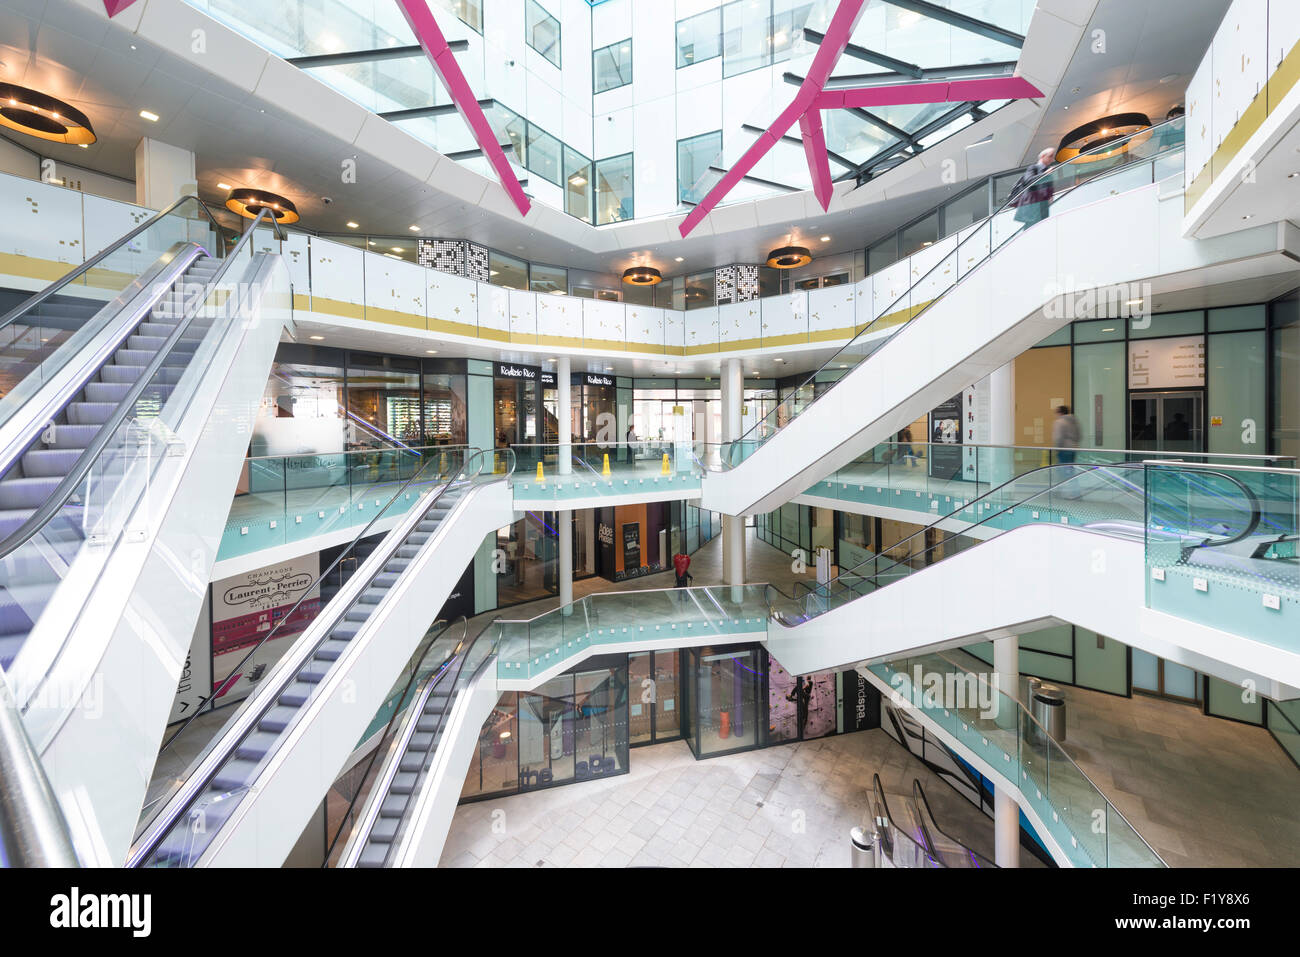 The Cube interiors, Birmingham Stock Photo, Royalty Free Image ...